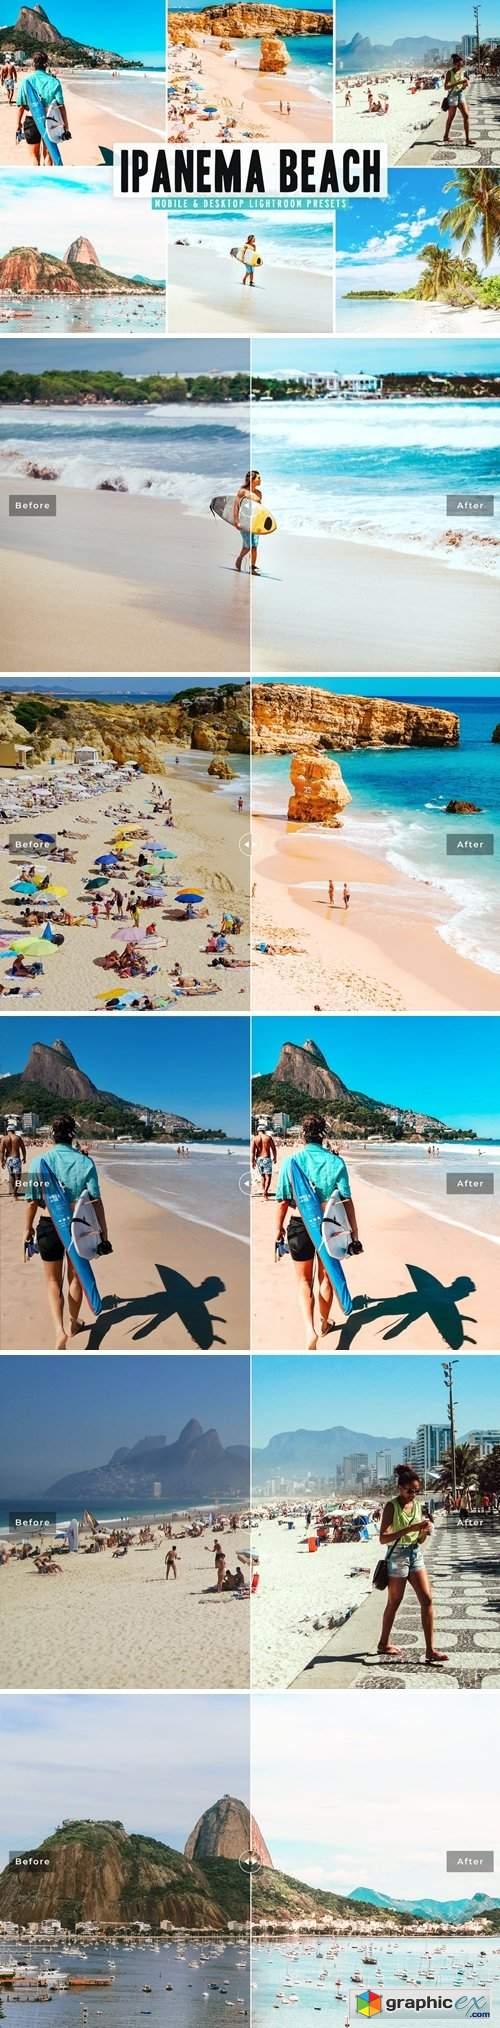 Ipanema Beach Mobile & Desktop Lightroom Presets